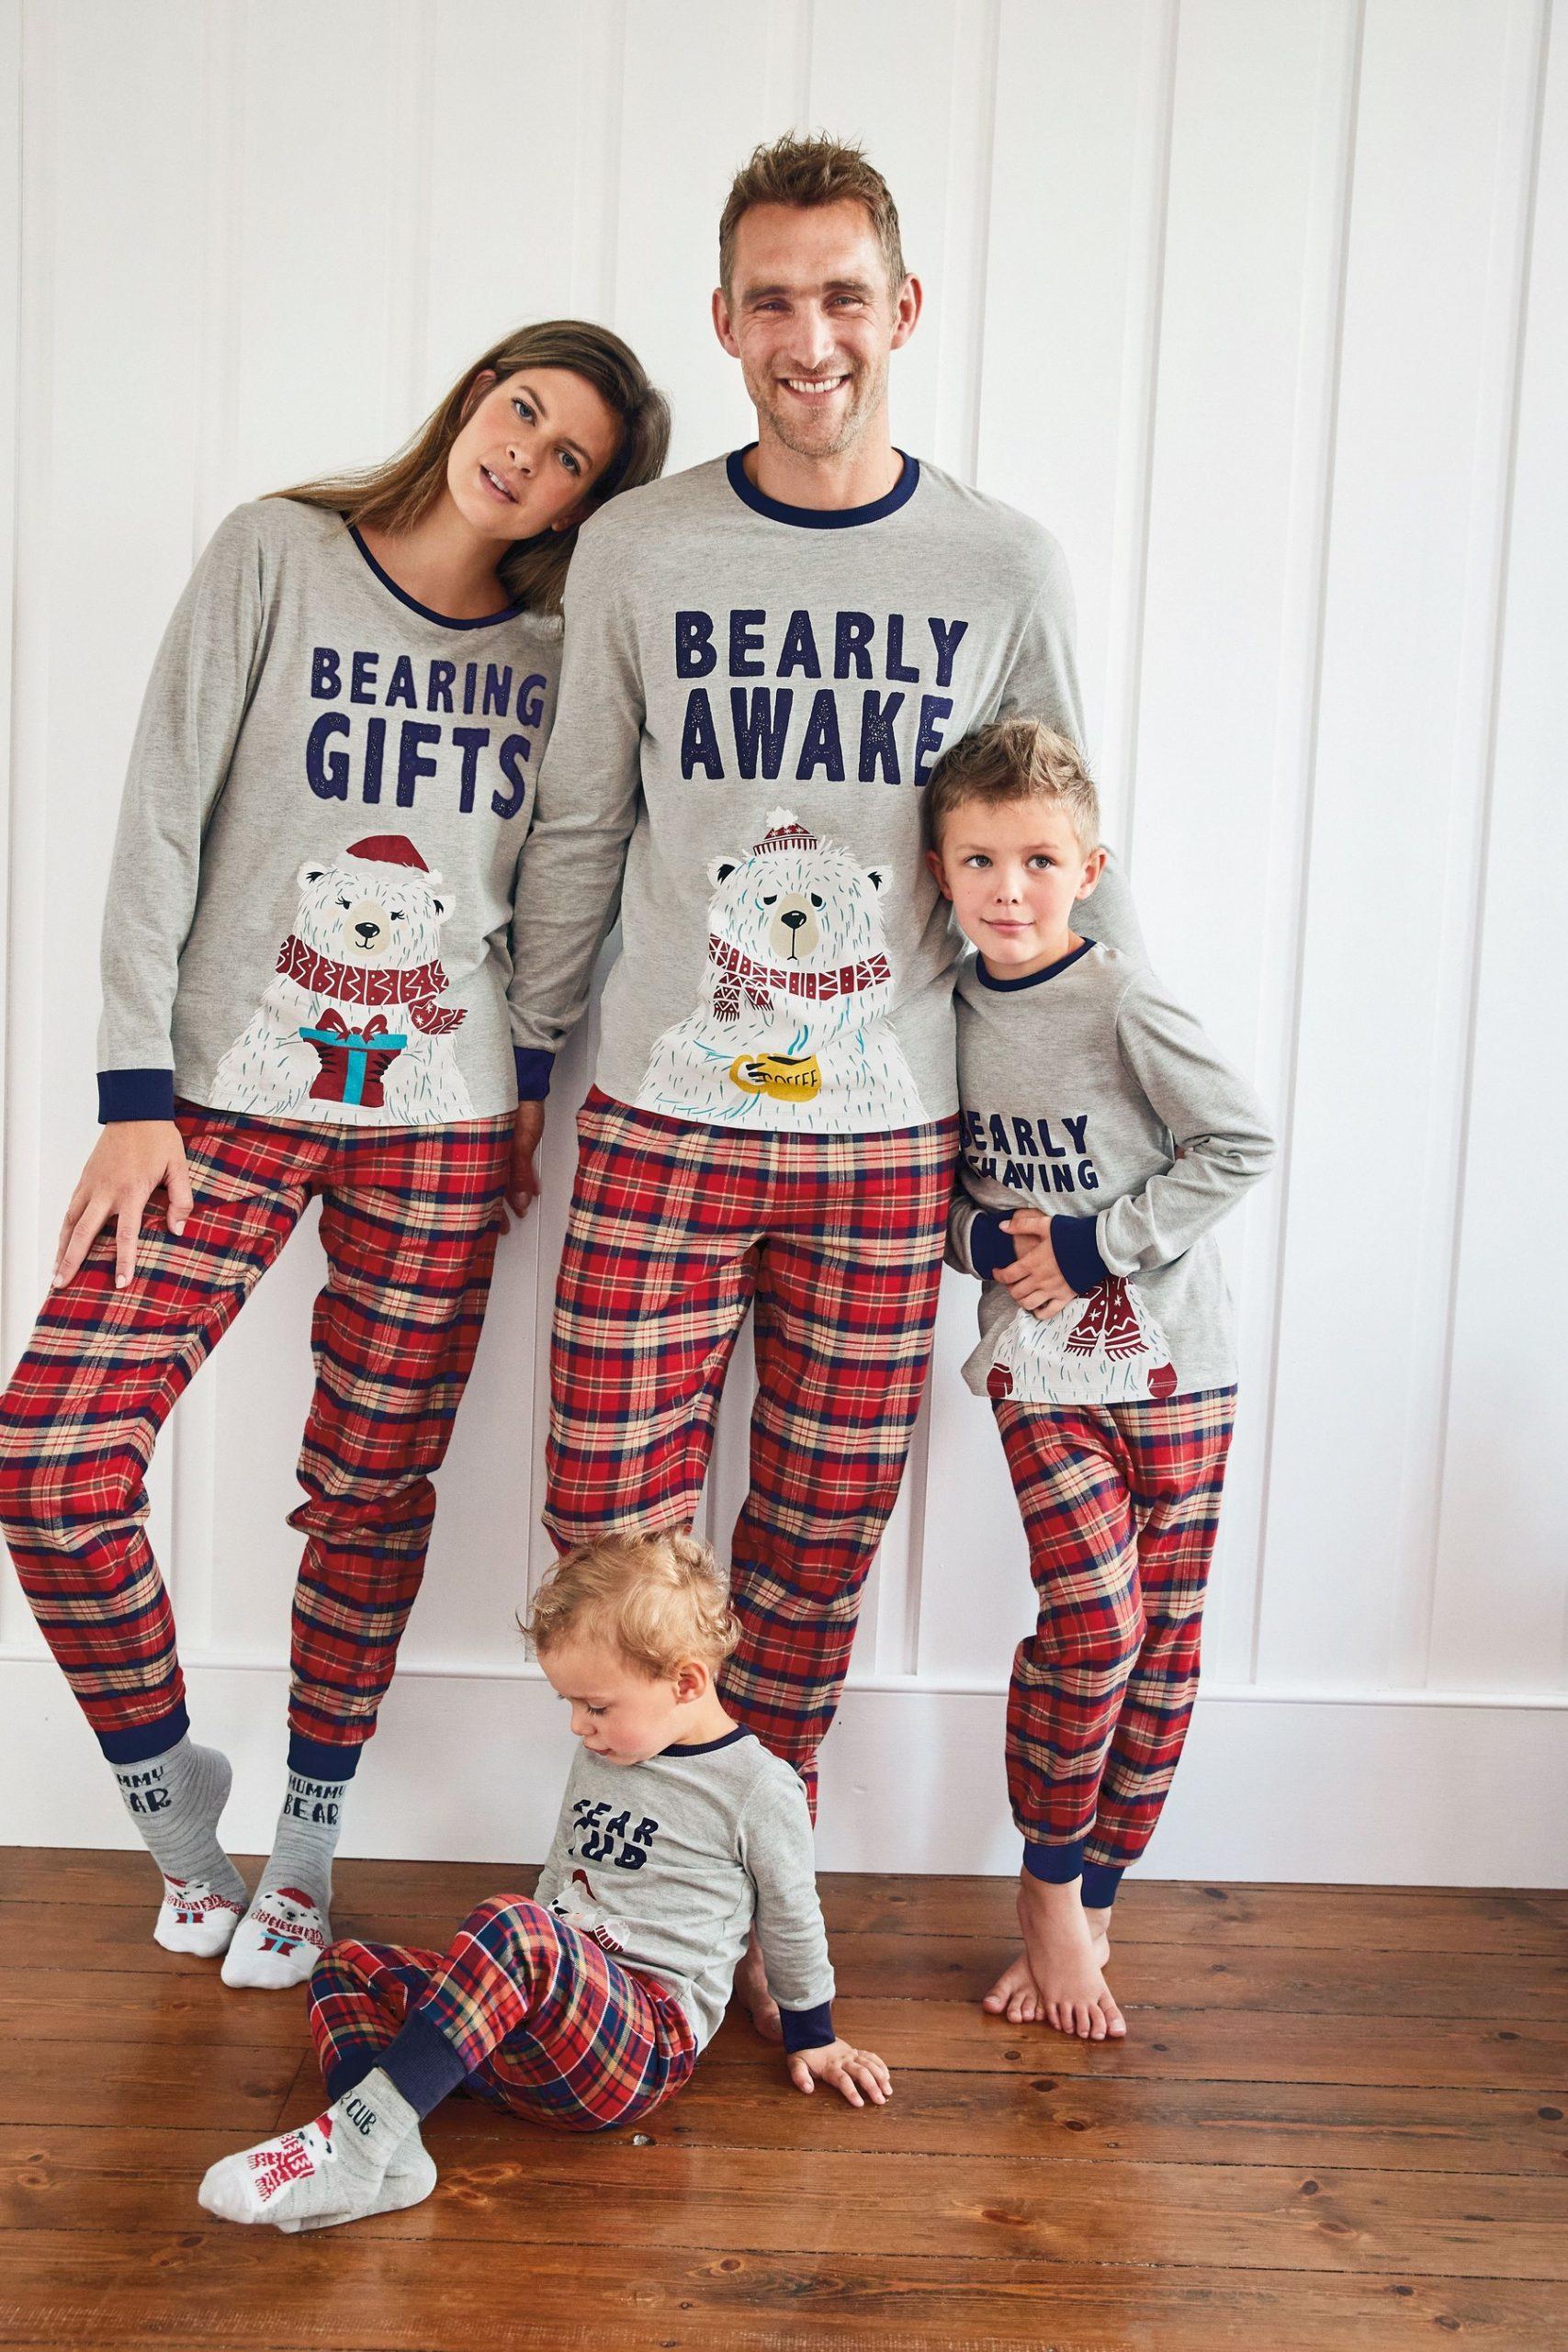 Christmas Family Matching Pyjama Sets Xmas Nightwear Outfits for Dad Mom Girl Boy Baby